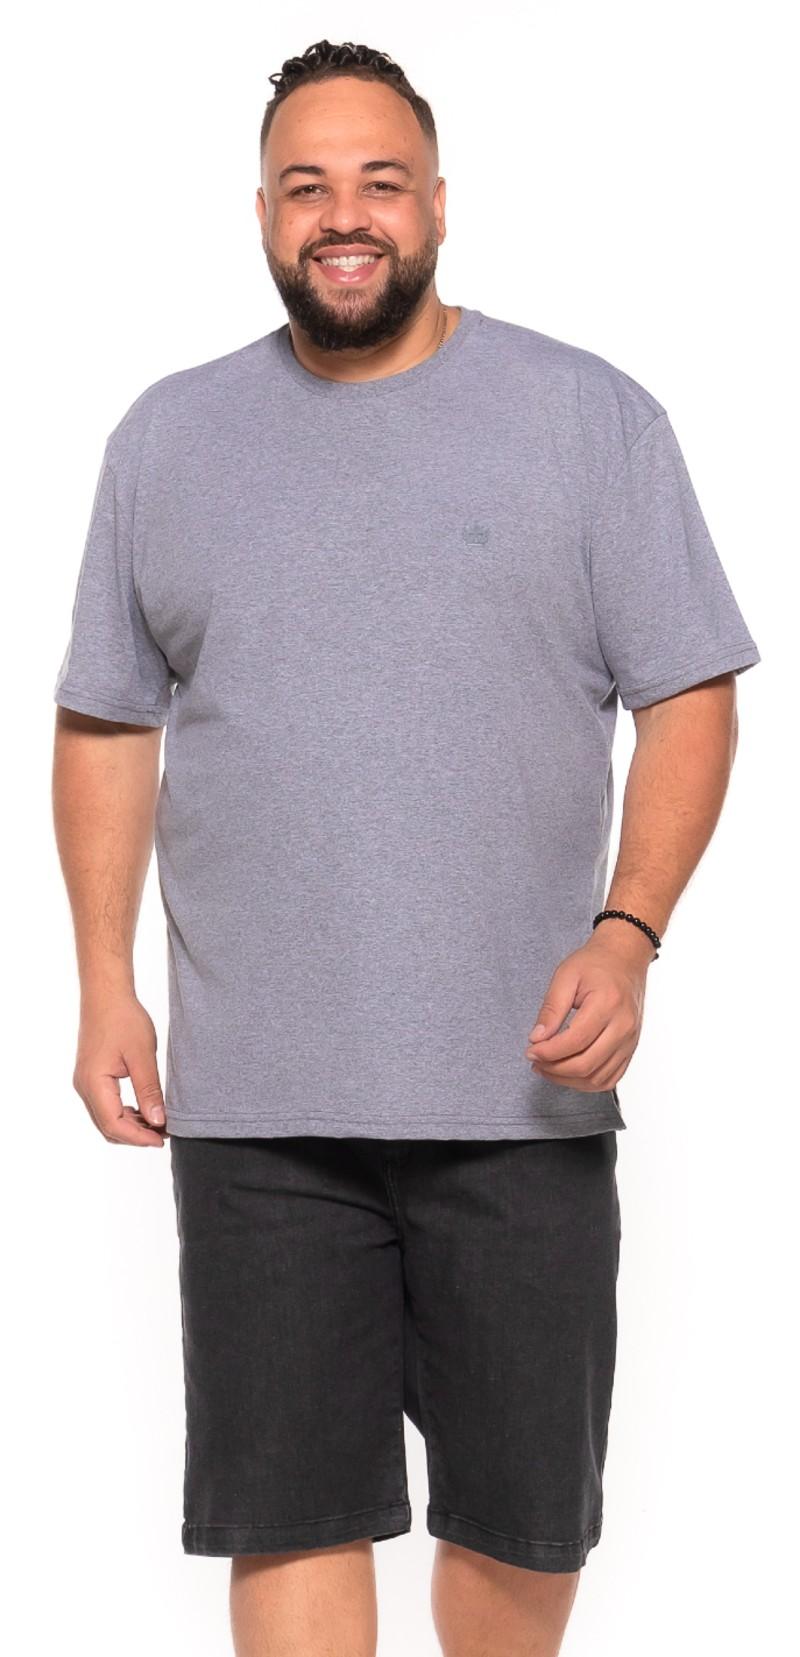 Camiseta plus size Cinza Mescla